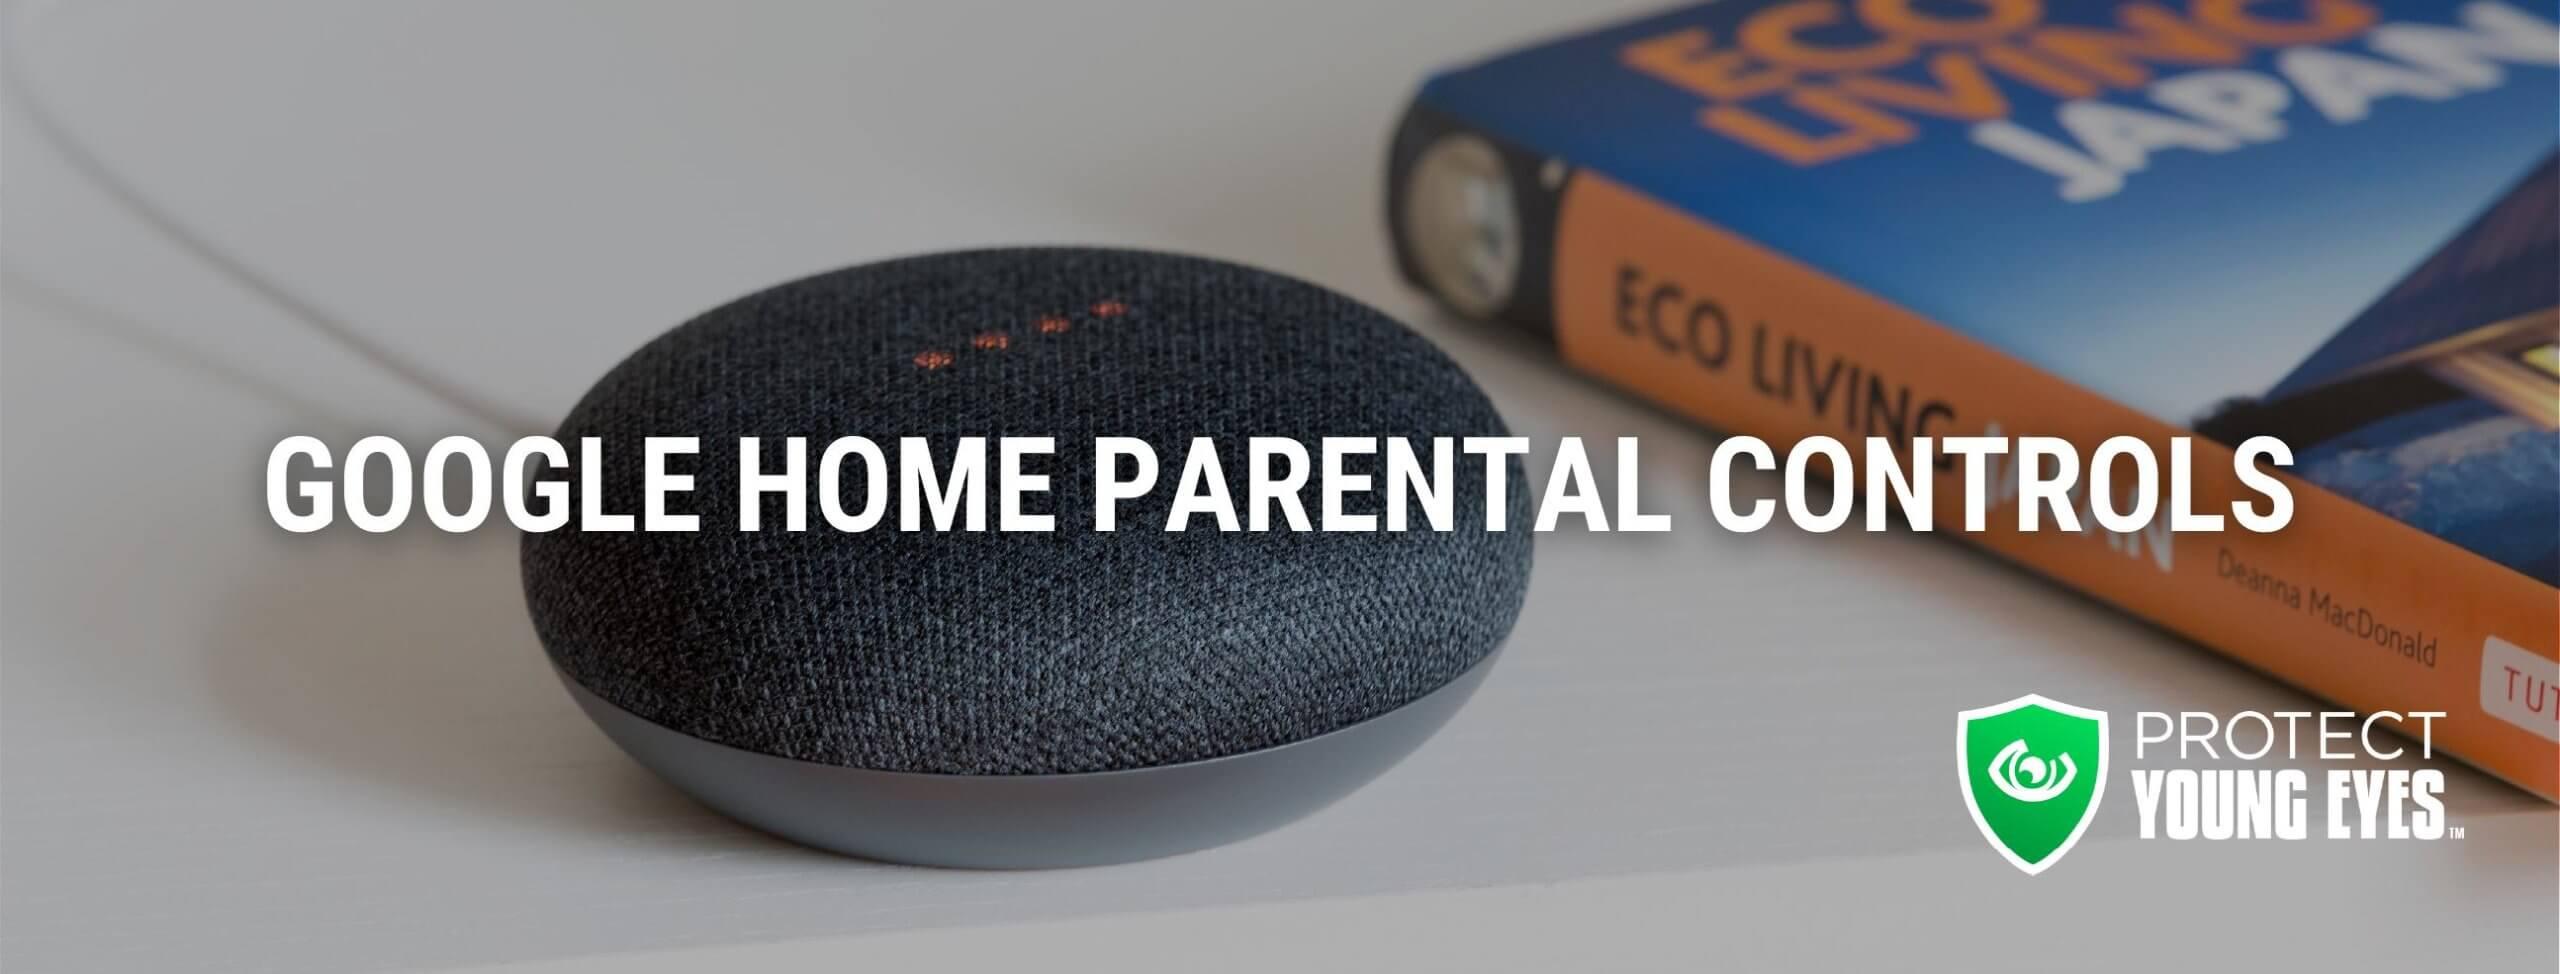 Google Home Parental Controls PYE